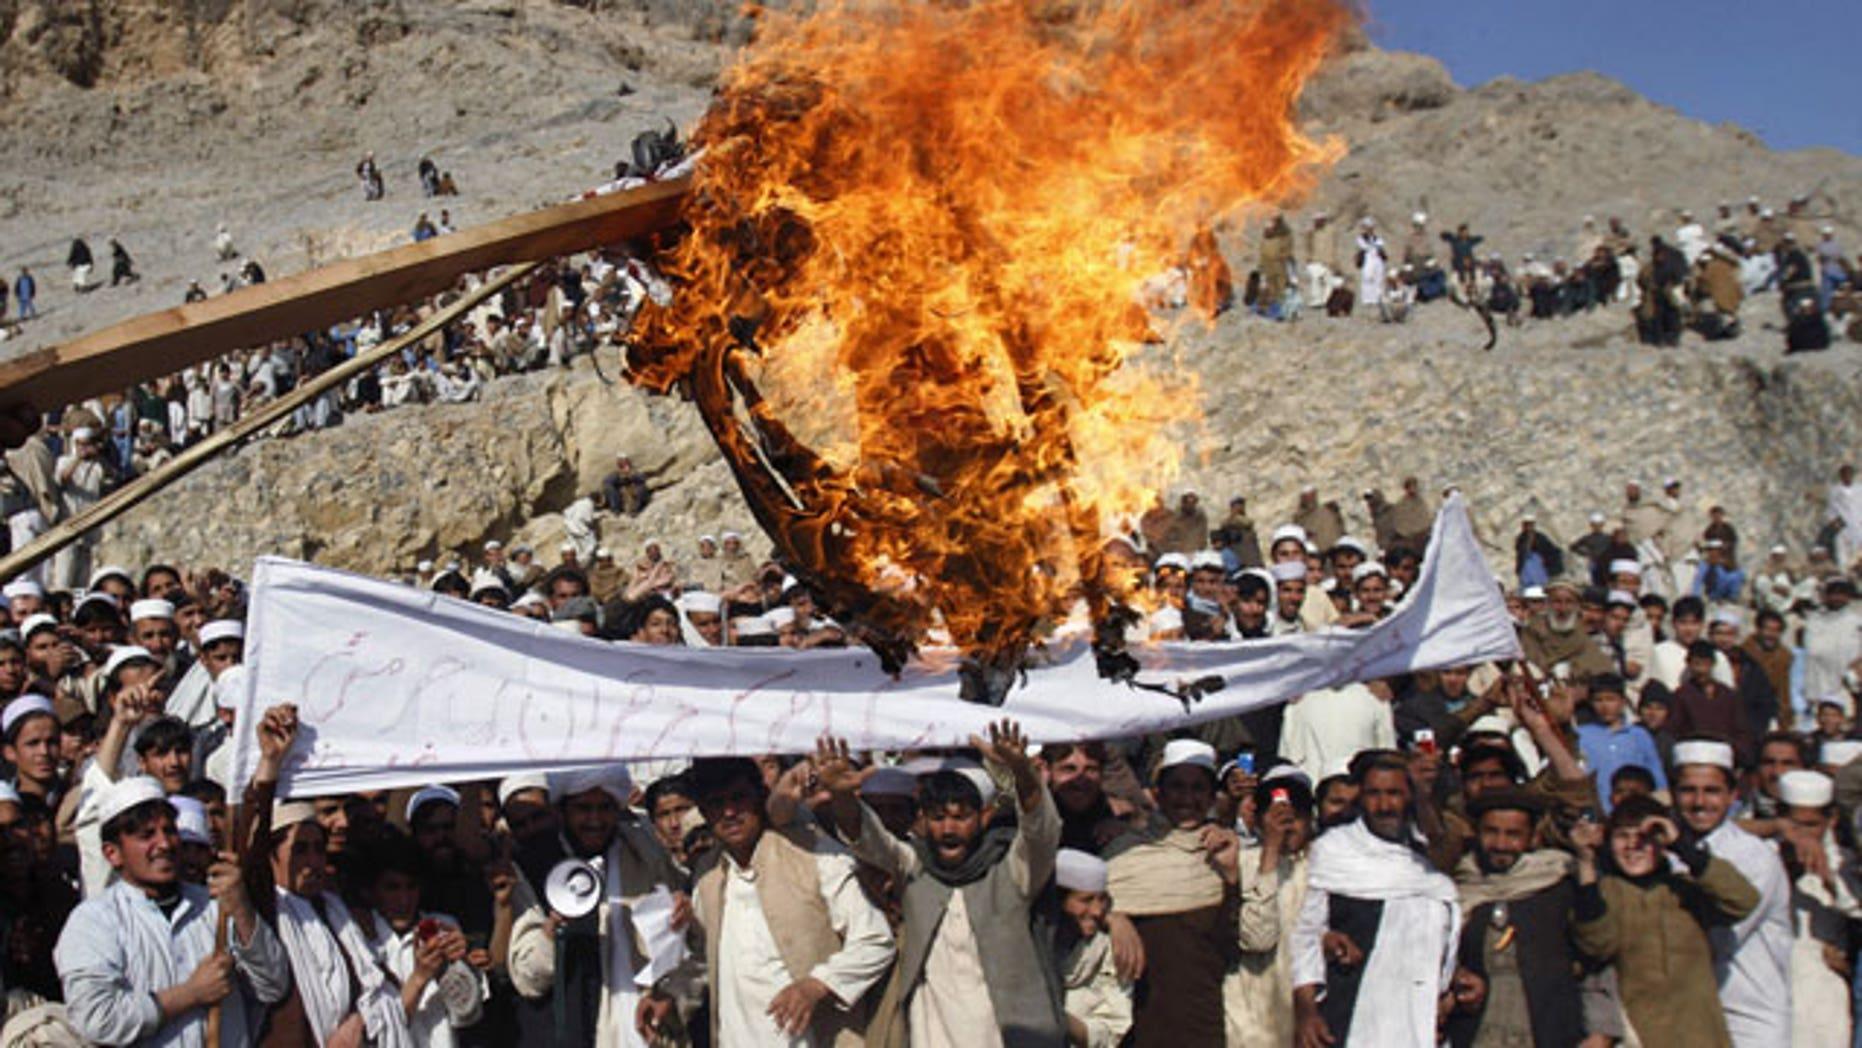 In this Feb. 24, 2012 file photo, Afghans burn an effigy representing U.S. President Barack Obama during an anti-U.S. protest in Ghani Khail, east of Kabul, Afghanistan.